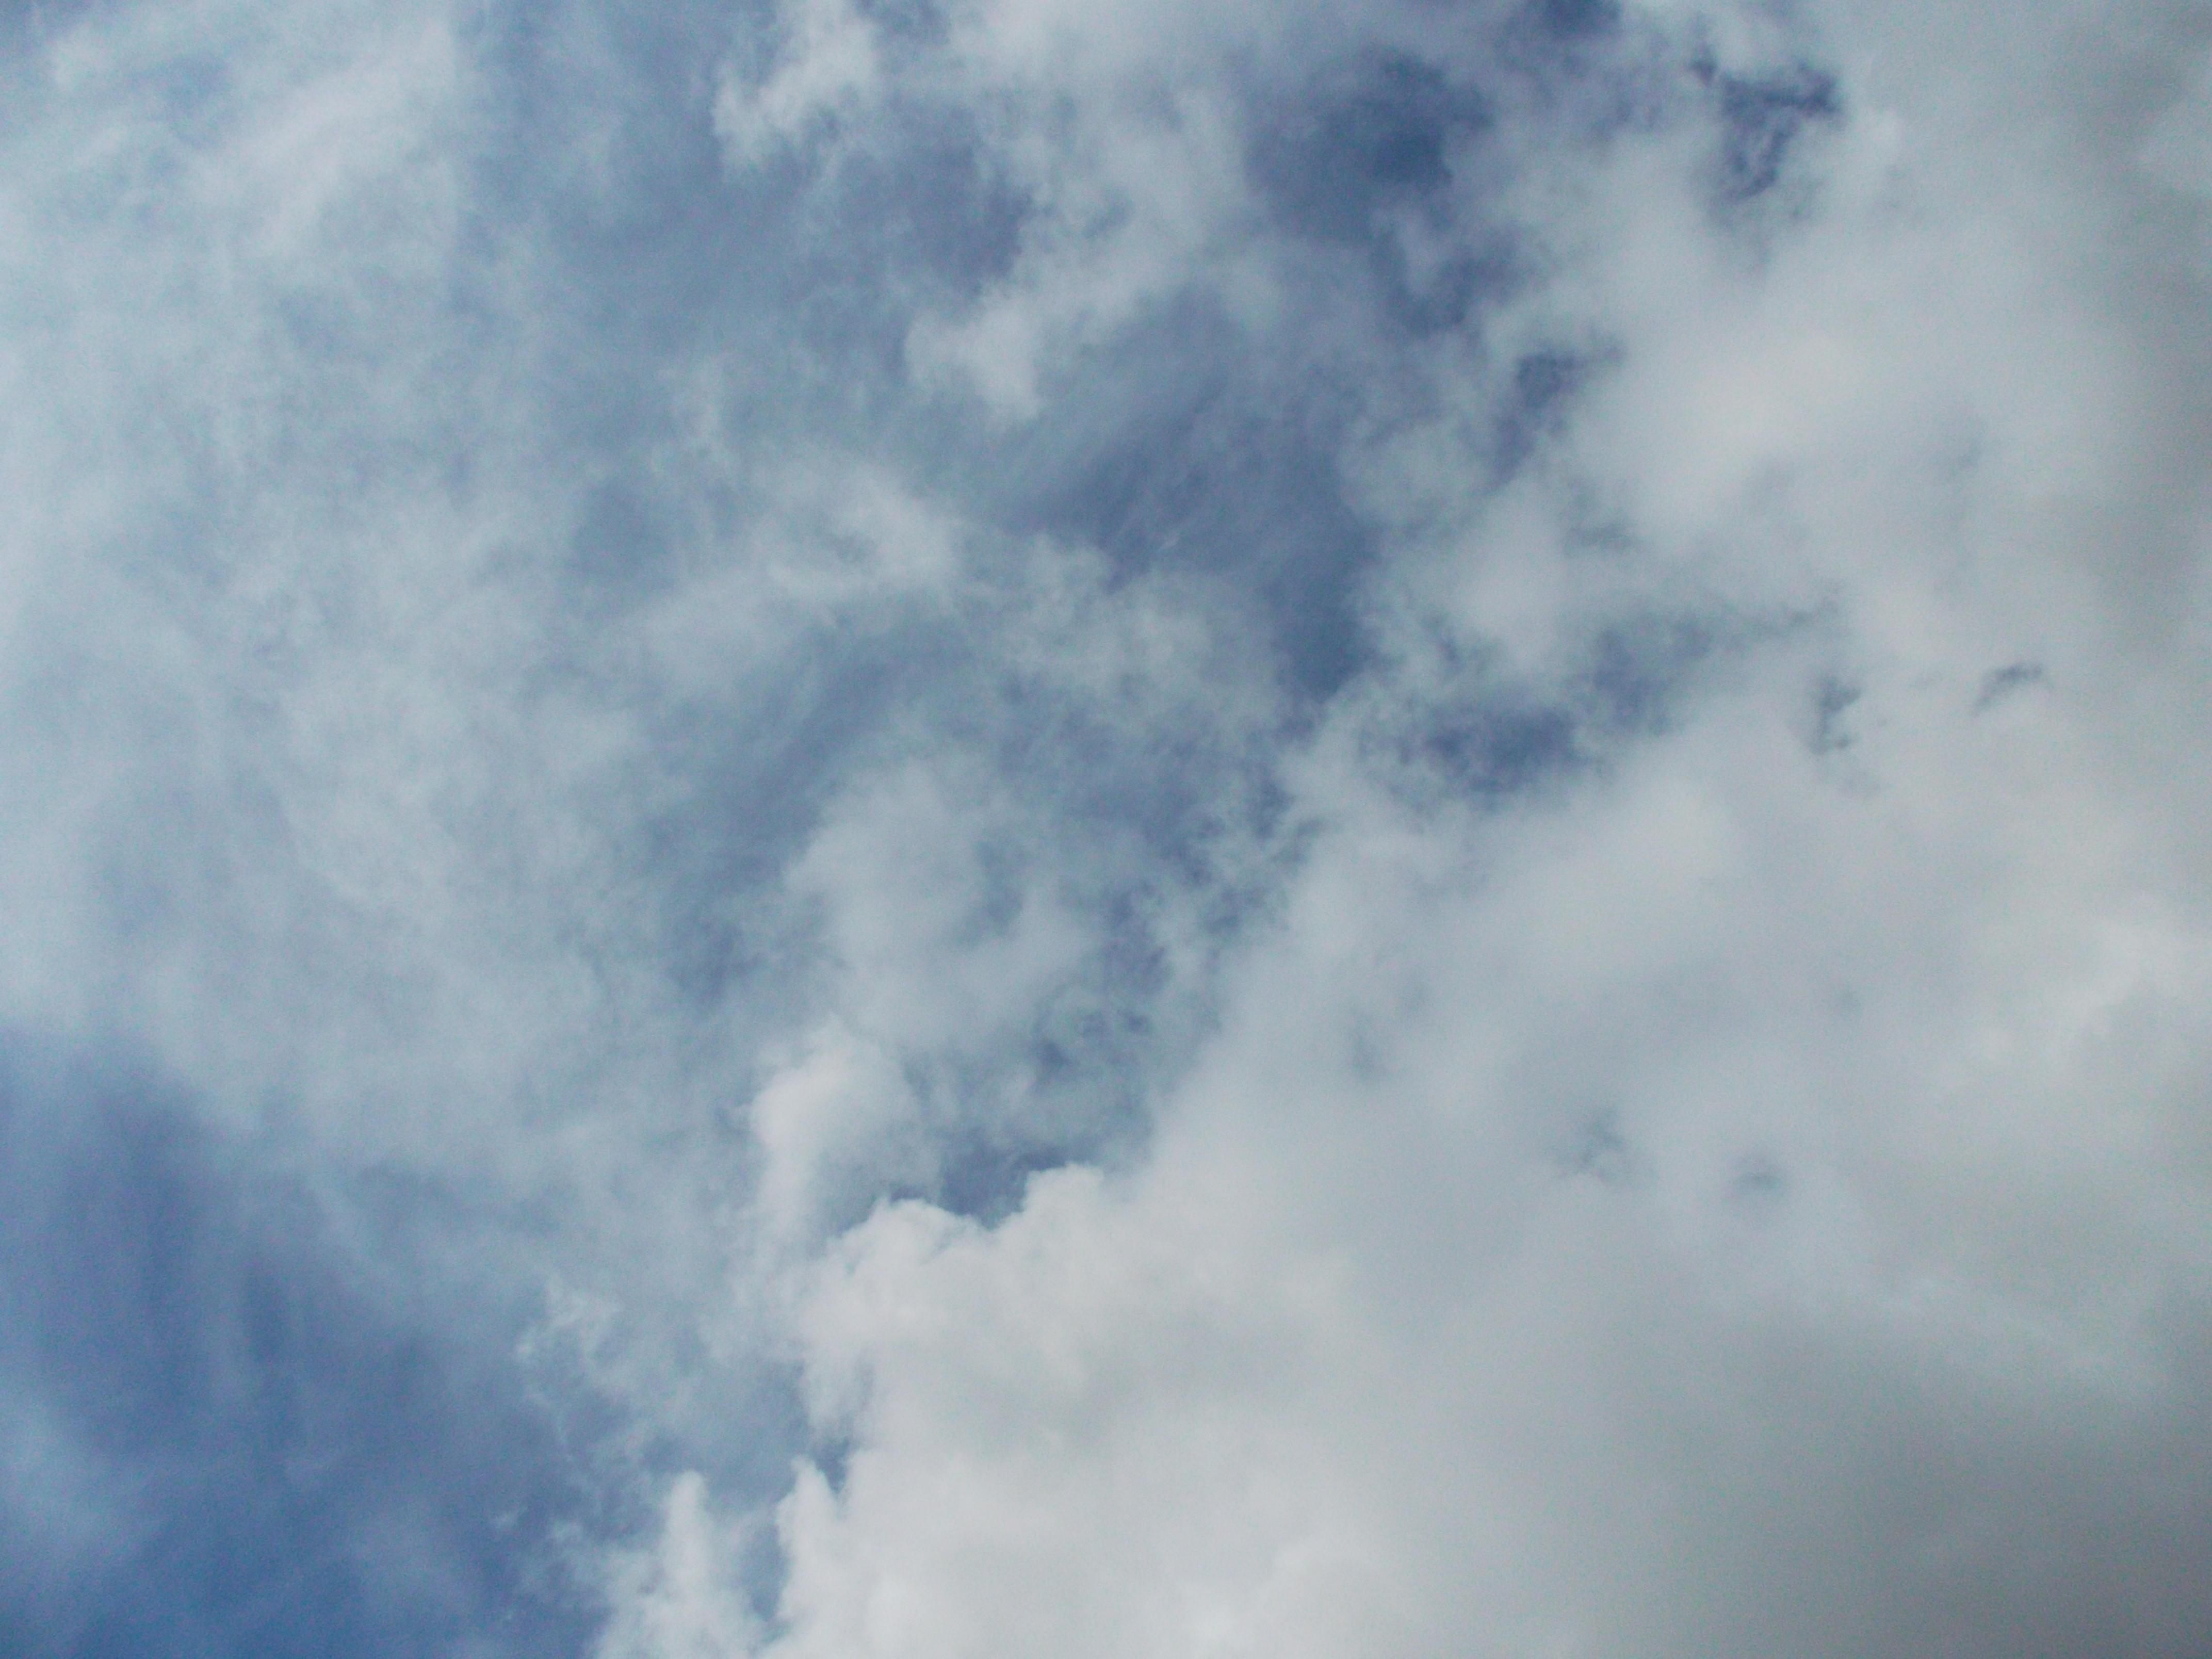 2013-03-19 Longitude -0.360578 Latitude 49.168919 Altitude 29 Heure 12h04